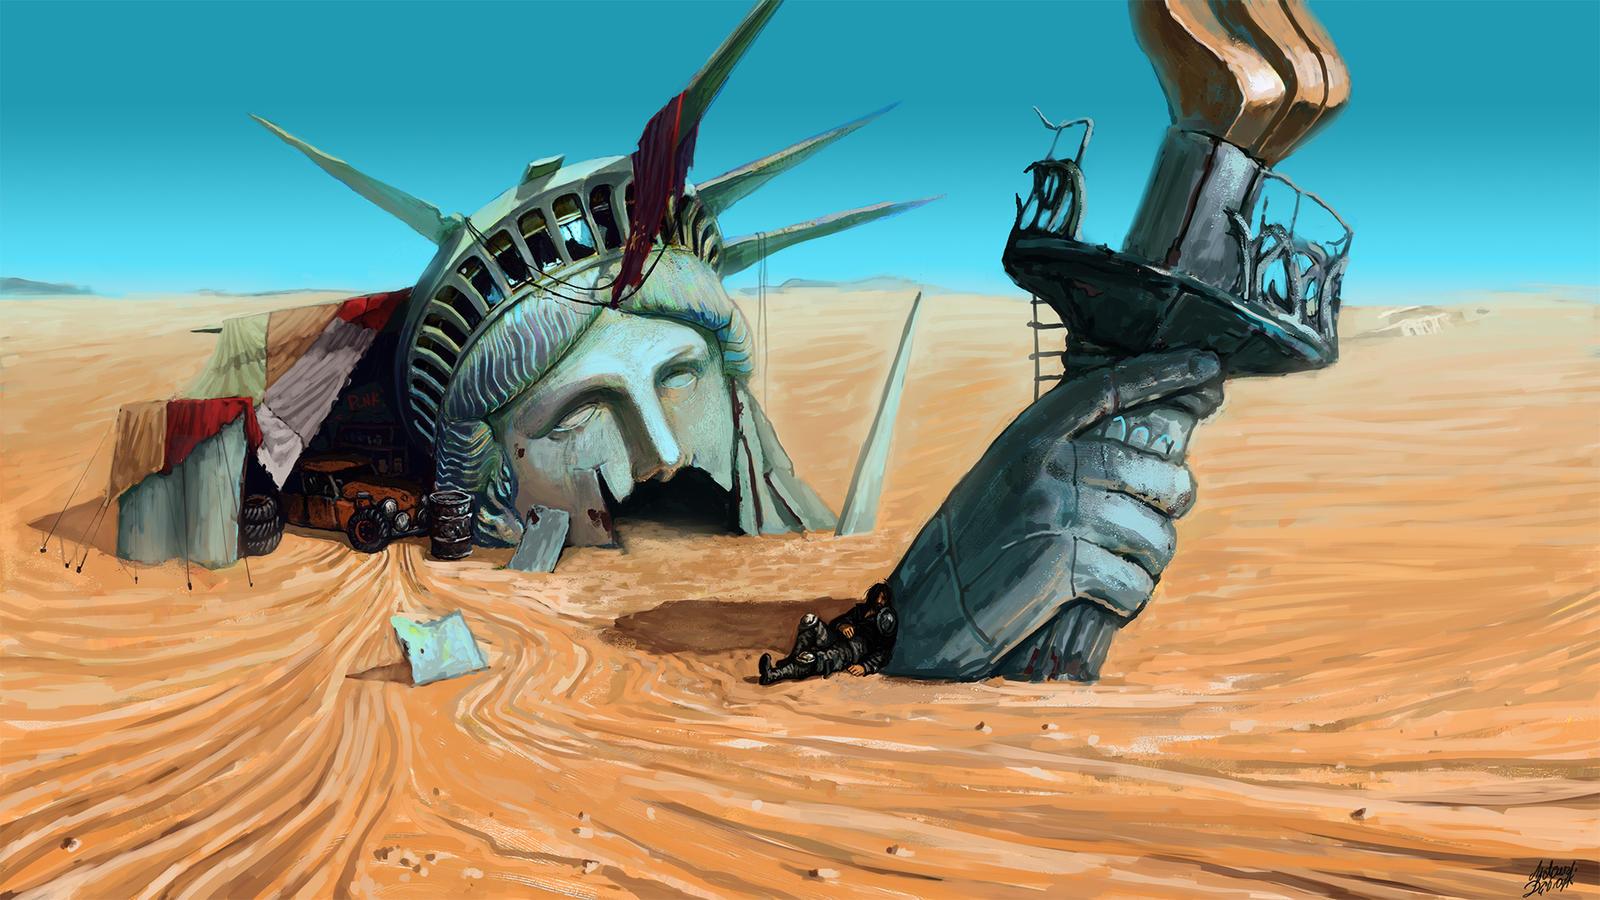 Price of liberty by Kwad-rat